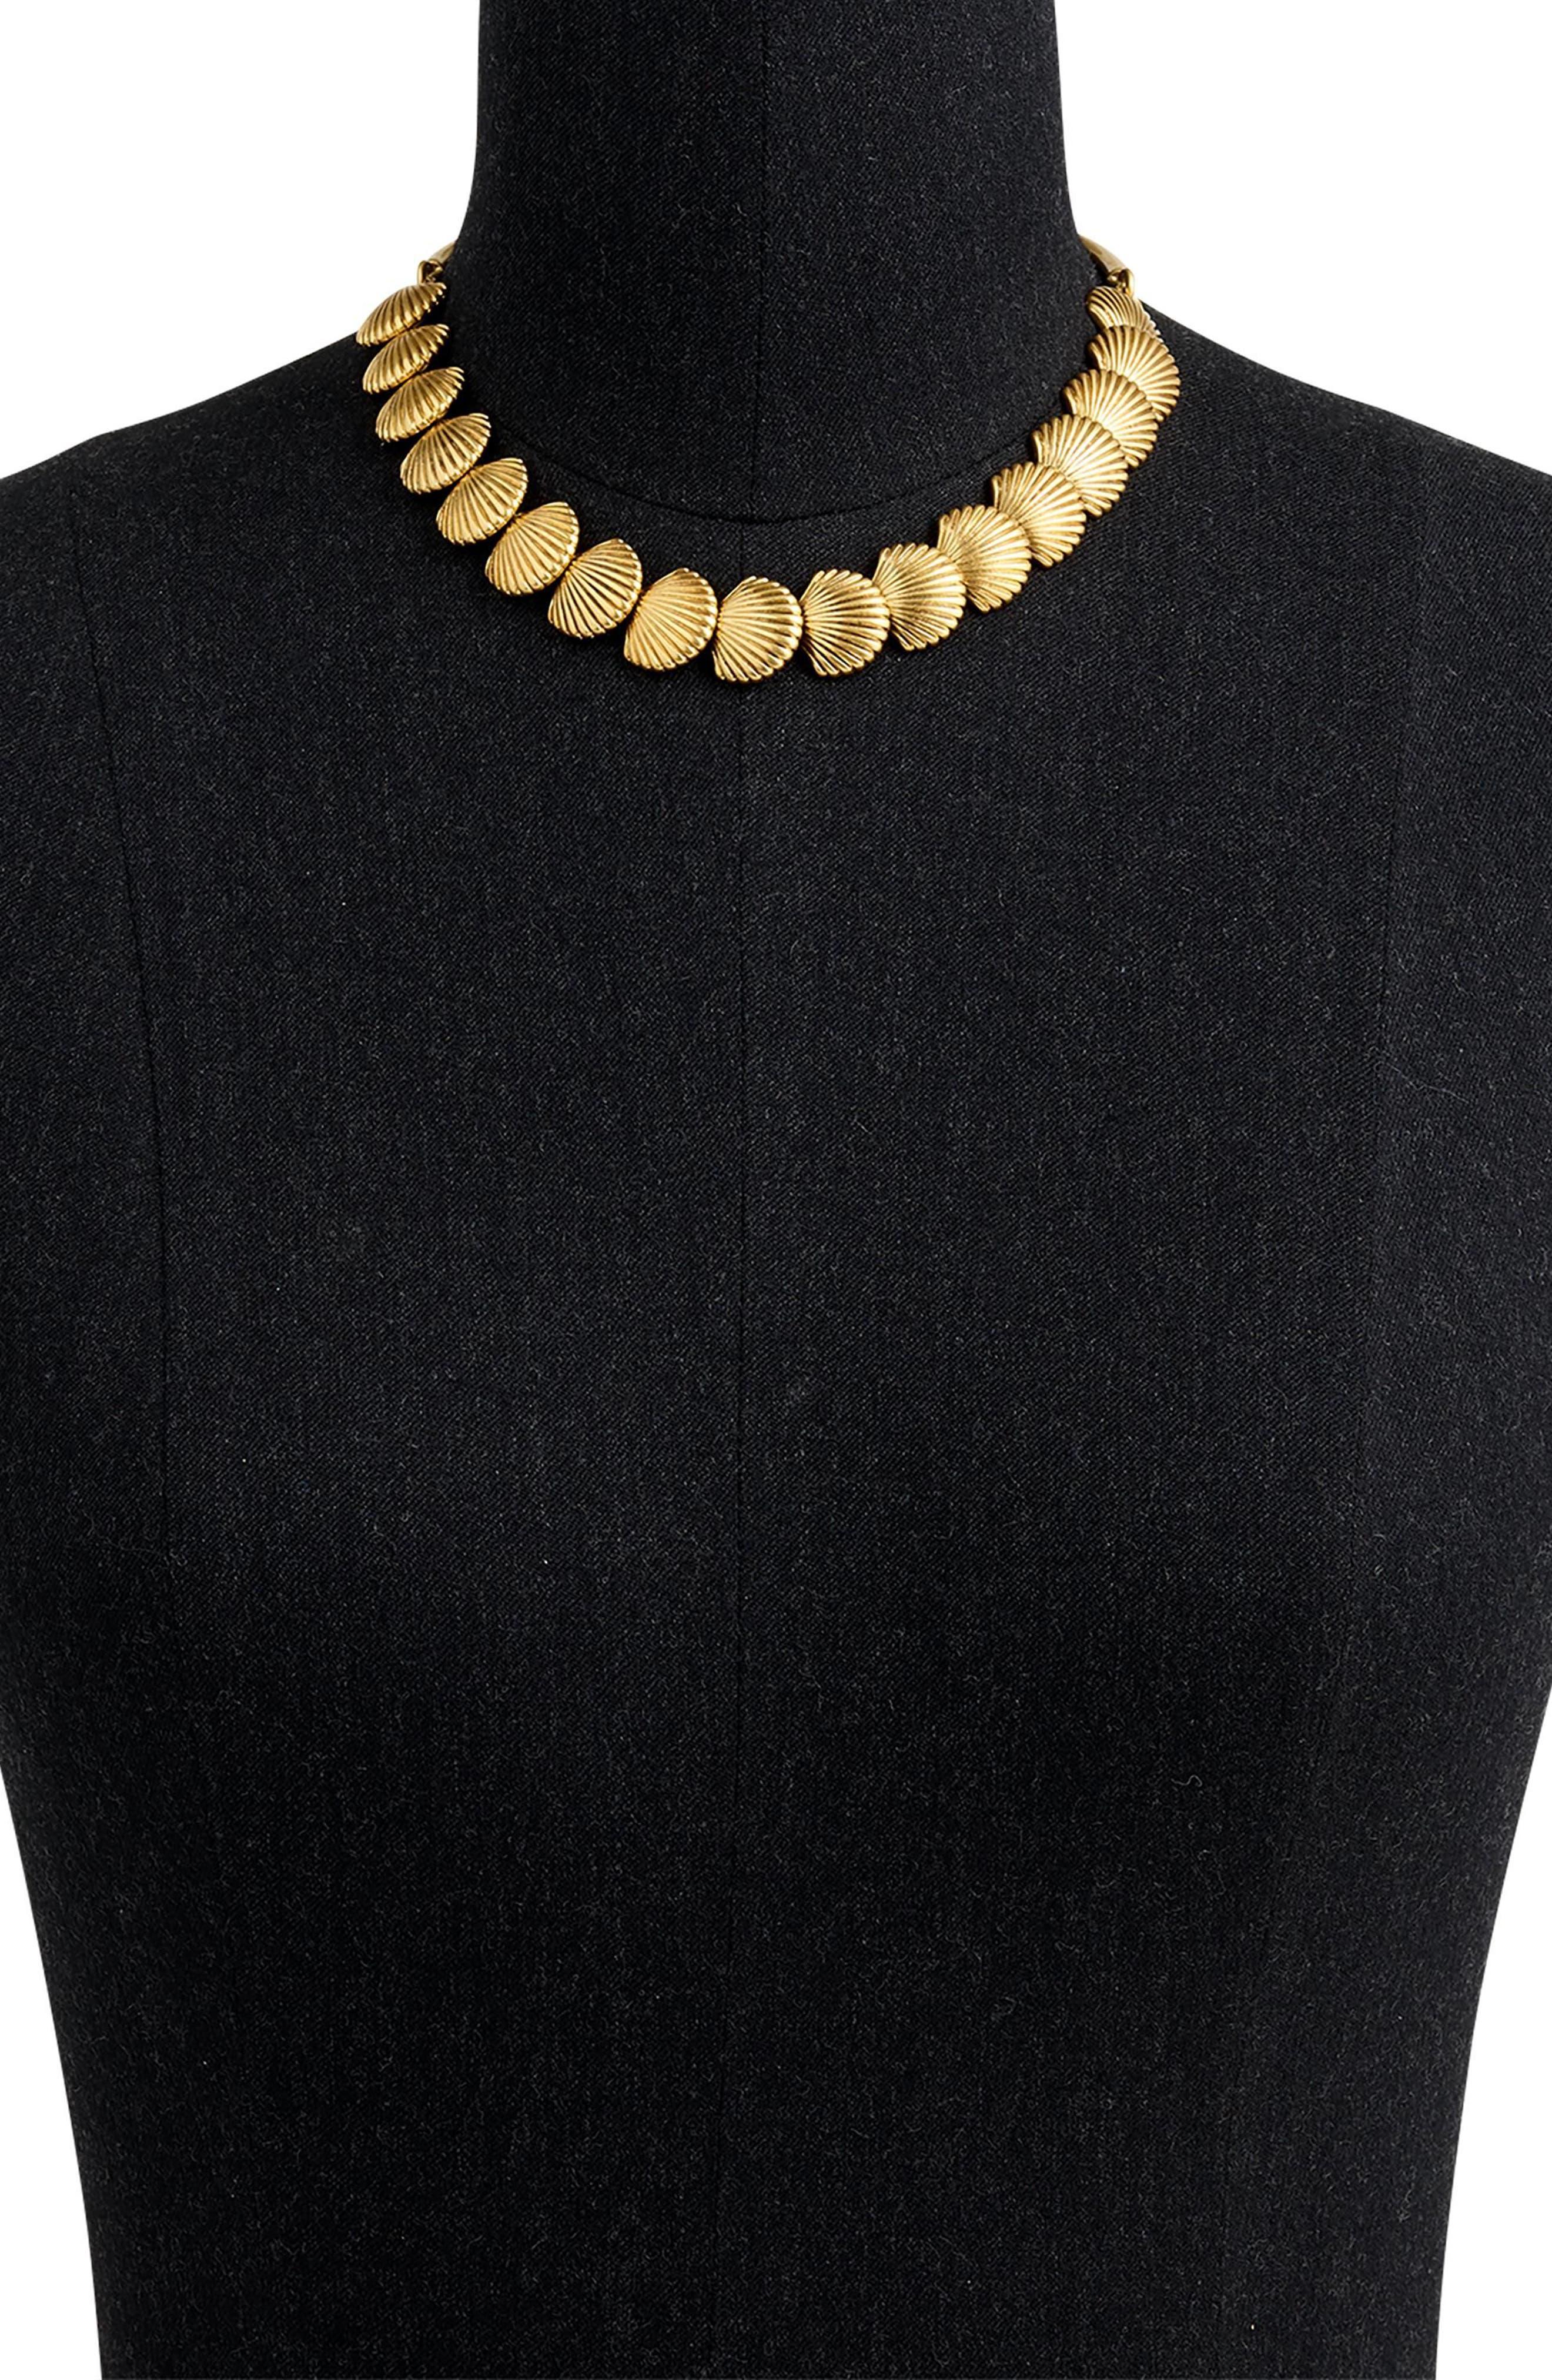 J.CREW,                             Seashell Collar Necklace,                             Alternate thumbnail 2, color,                             710